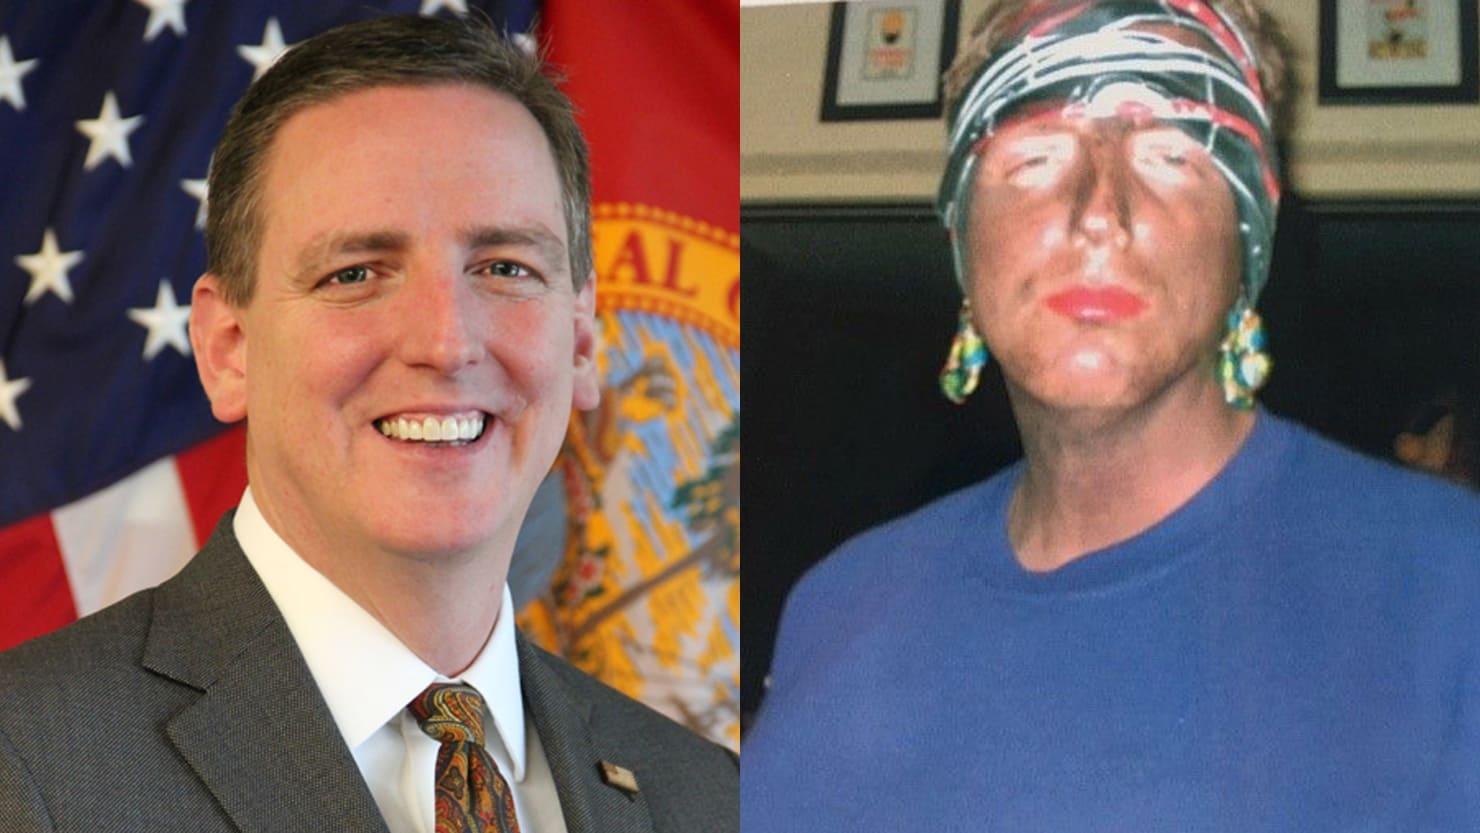 Florida secretary of state resigns after blackface photos emerge